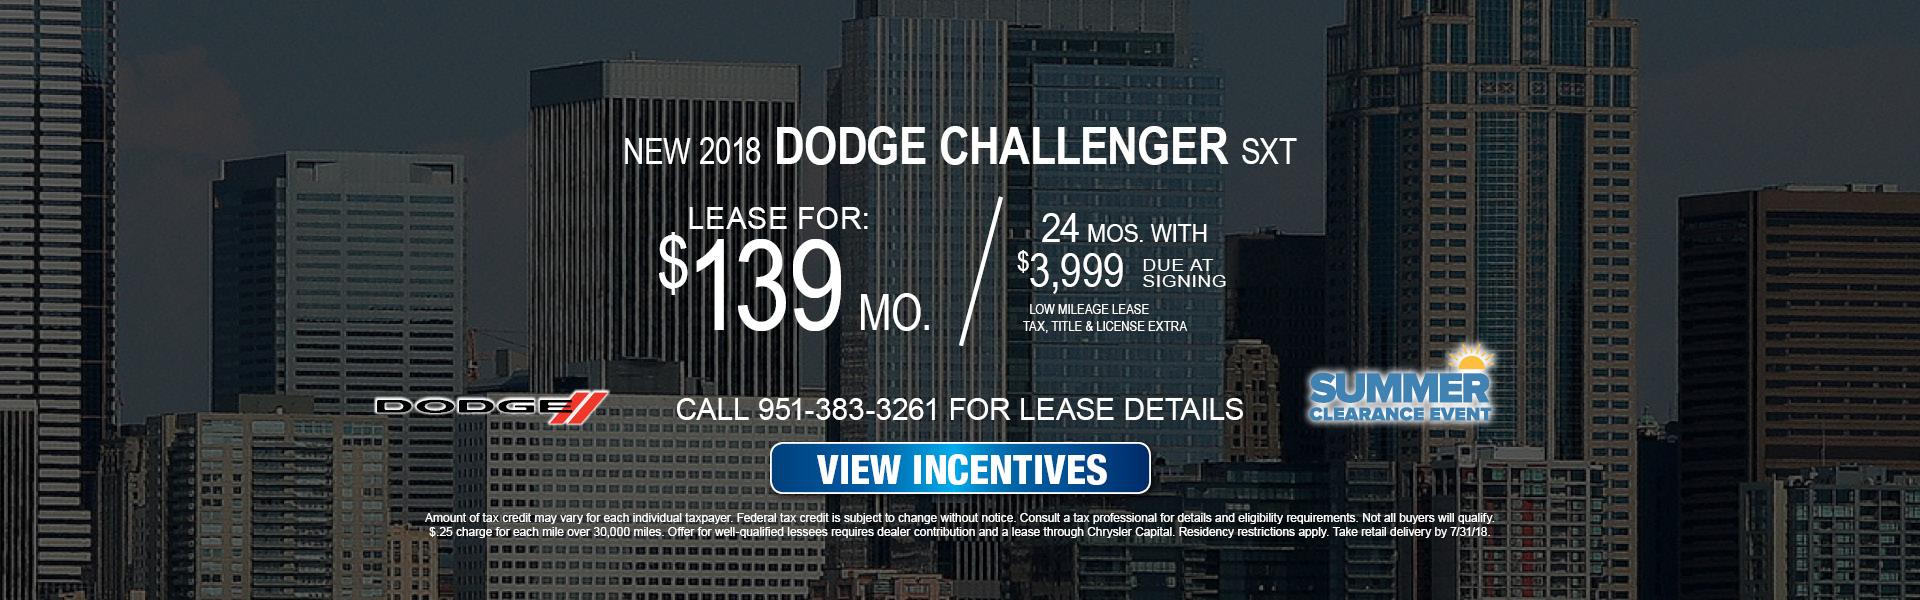 Dodge Challenger $139 Lease